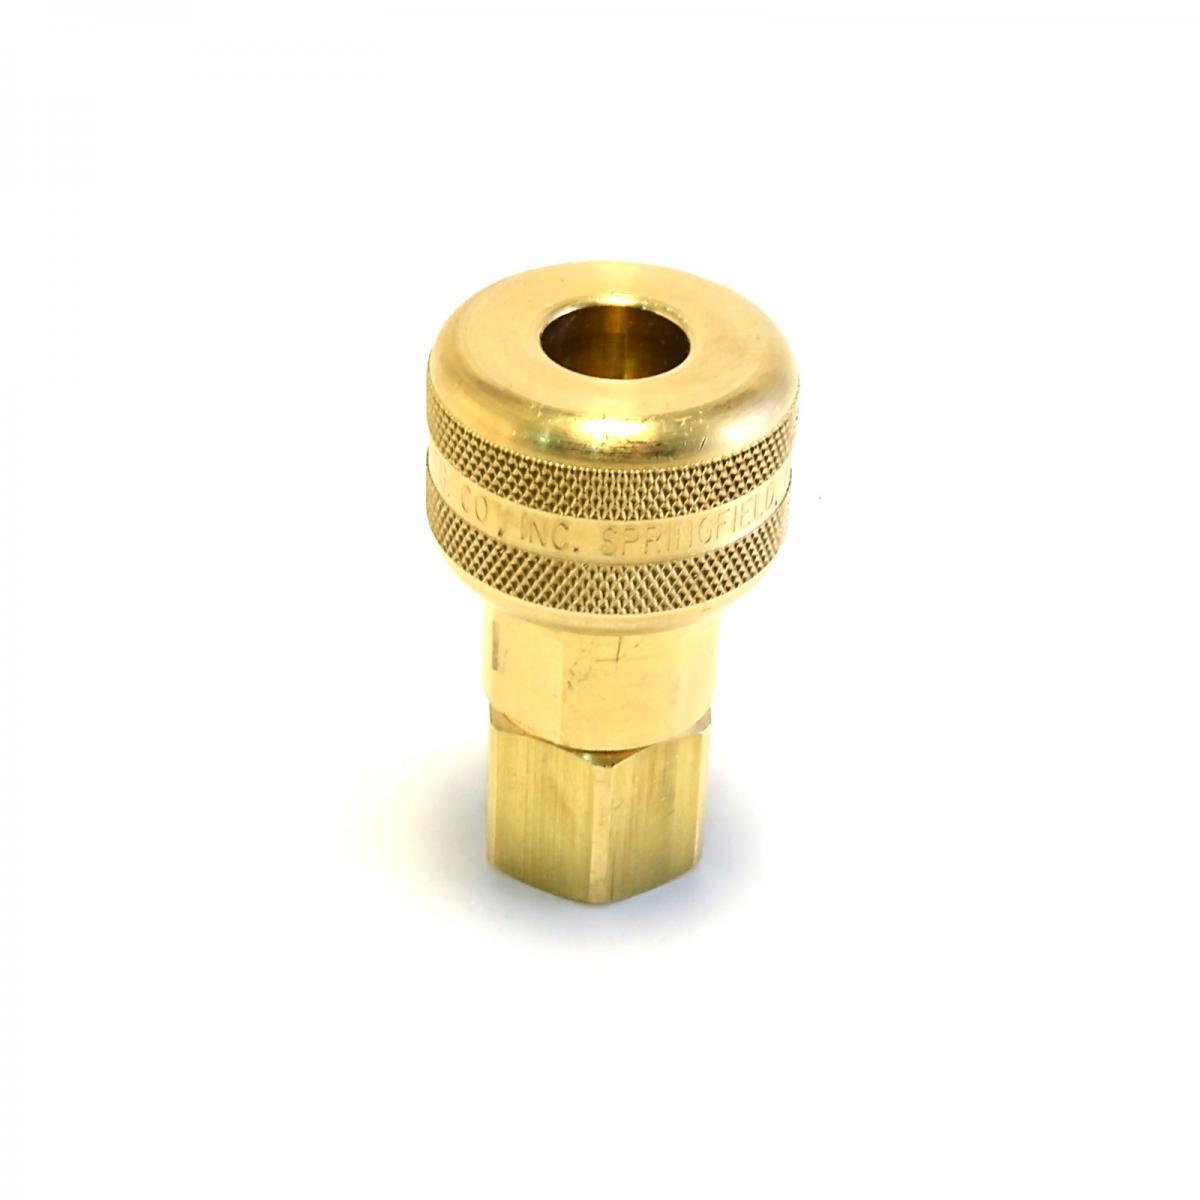 Female npt industrial quick coupler air hose